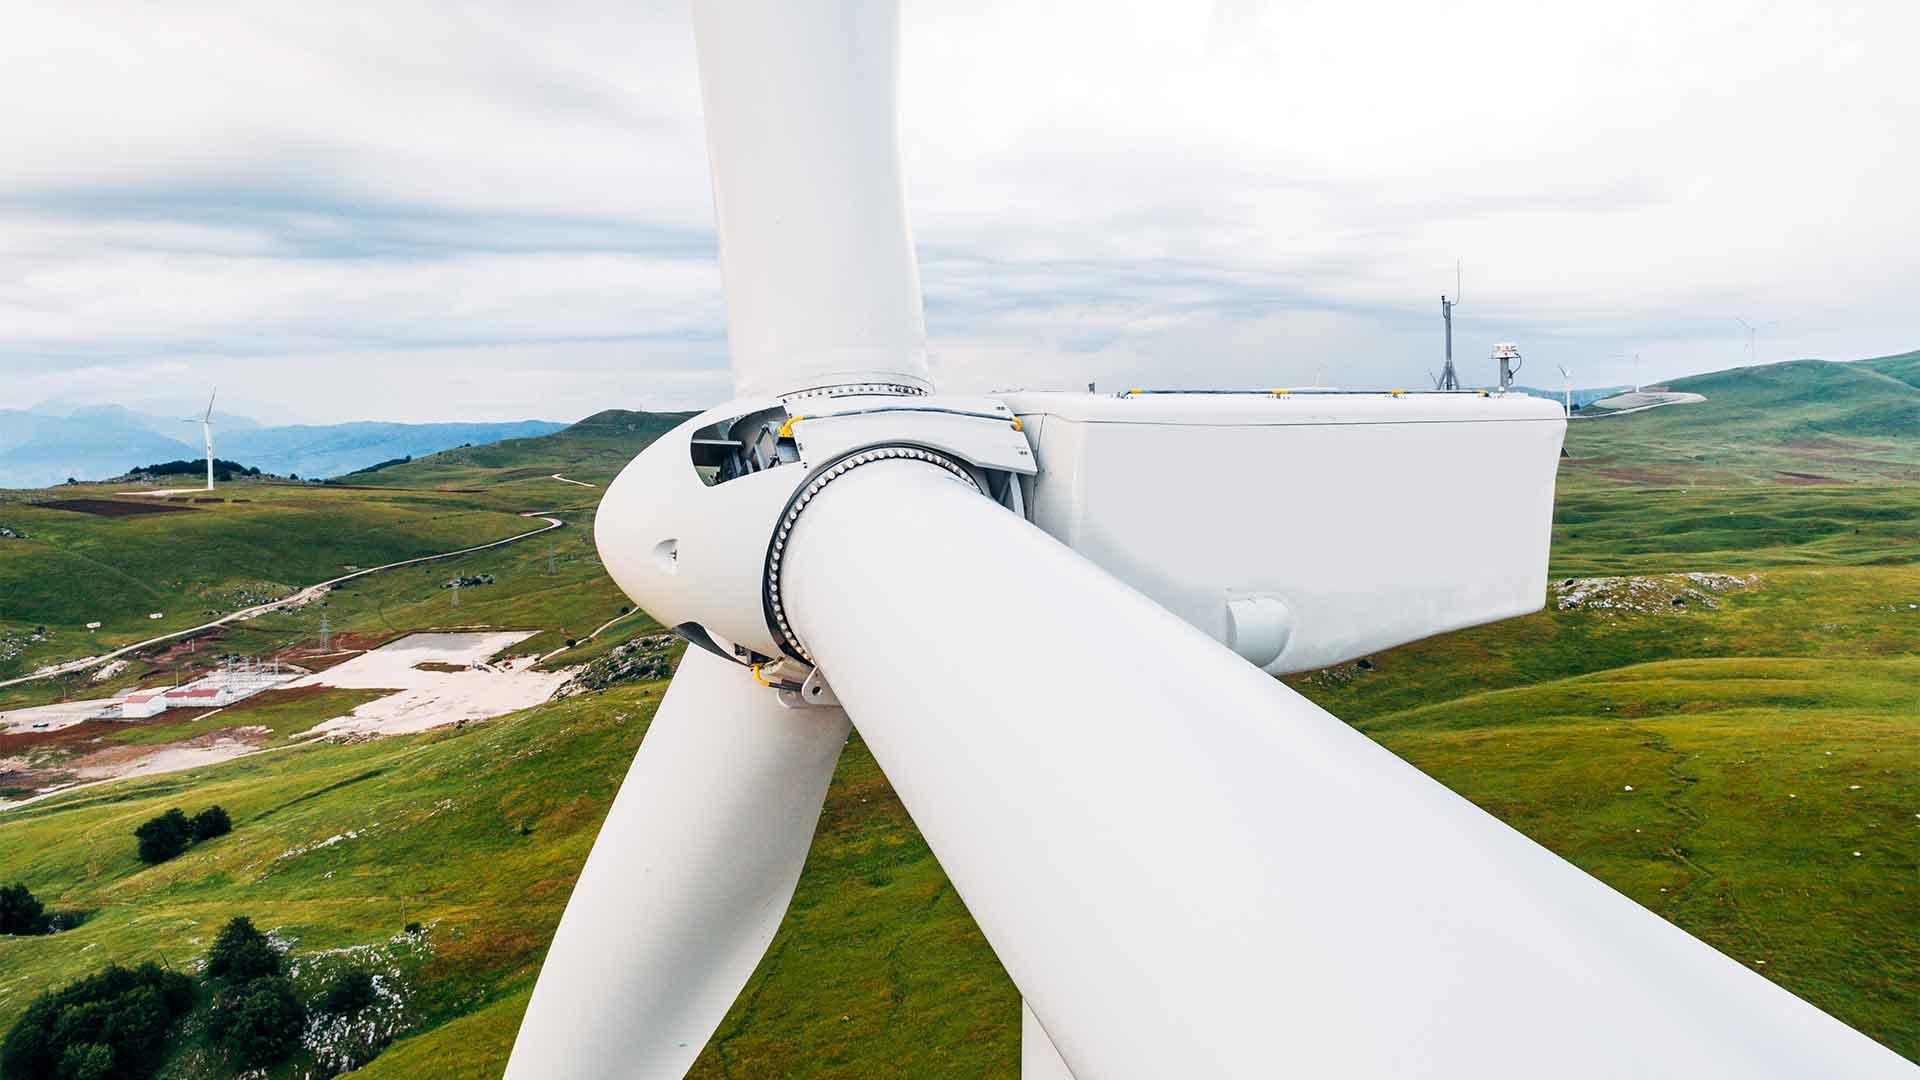 Boron Magnets are the Future for Wind Turbines